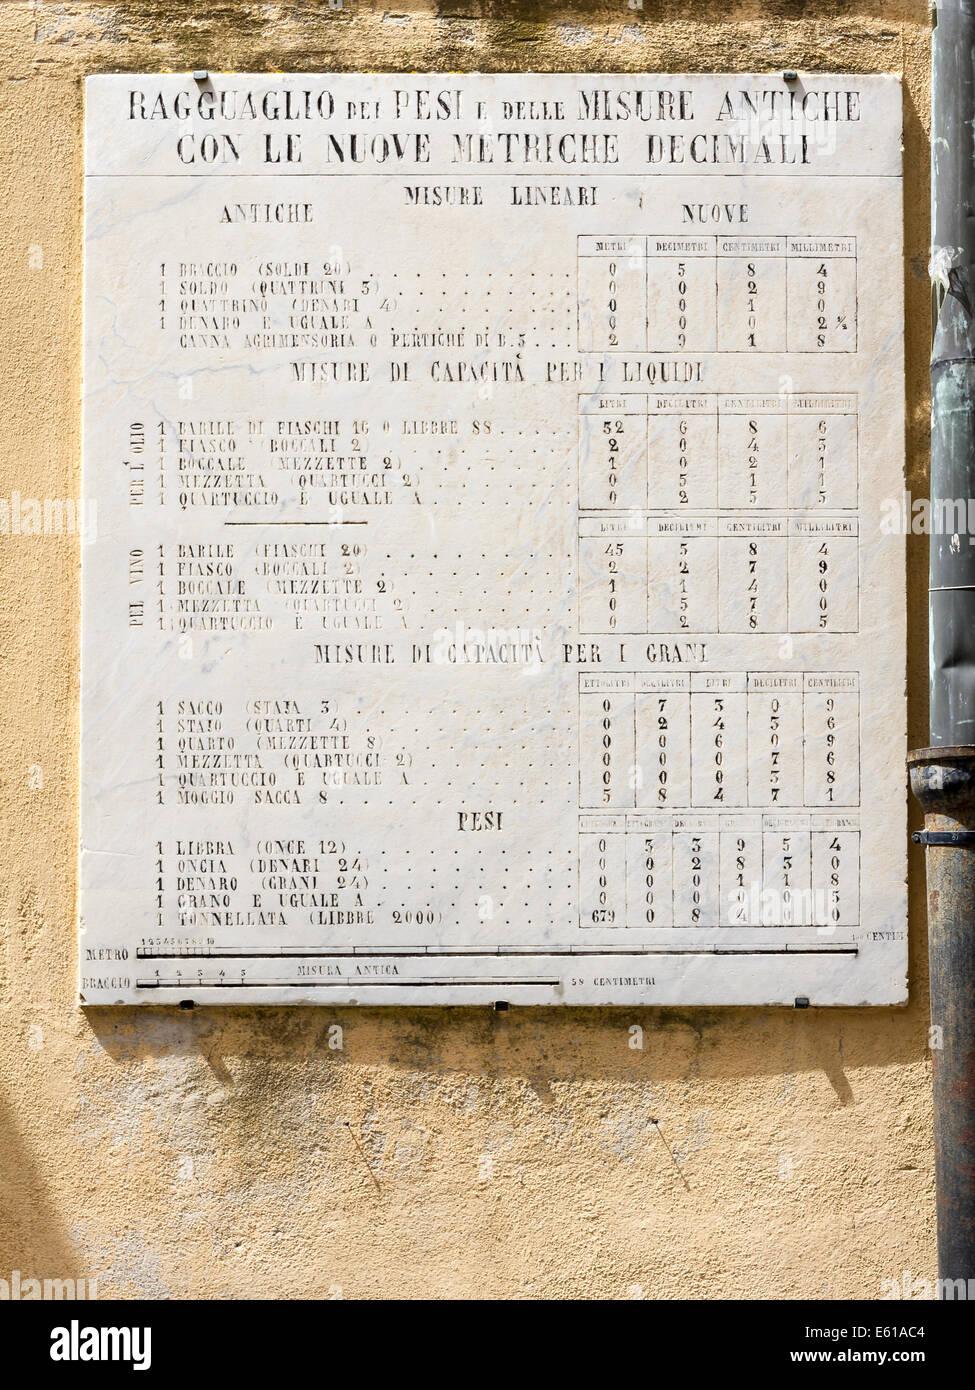 Metric system old plaque in Campiglia Marittima, a comune (municipality) in the Italian region Tuscany - Stock Image